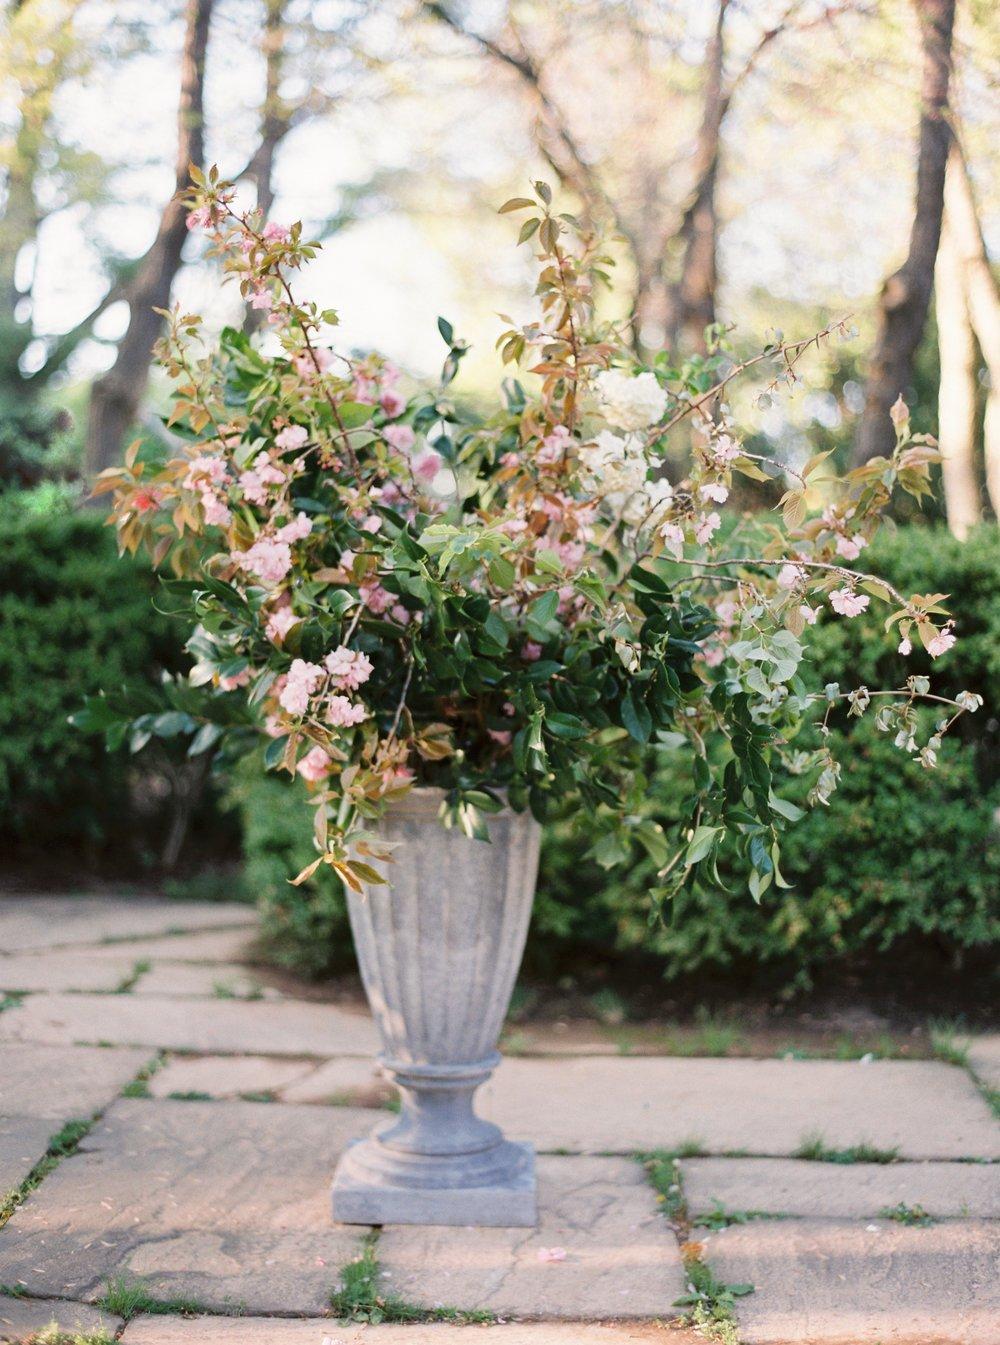 amelia_johnson_photography_laura&henry_wedding00194.jpg